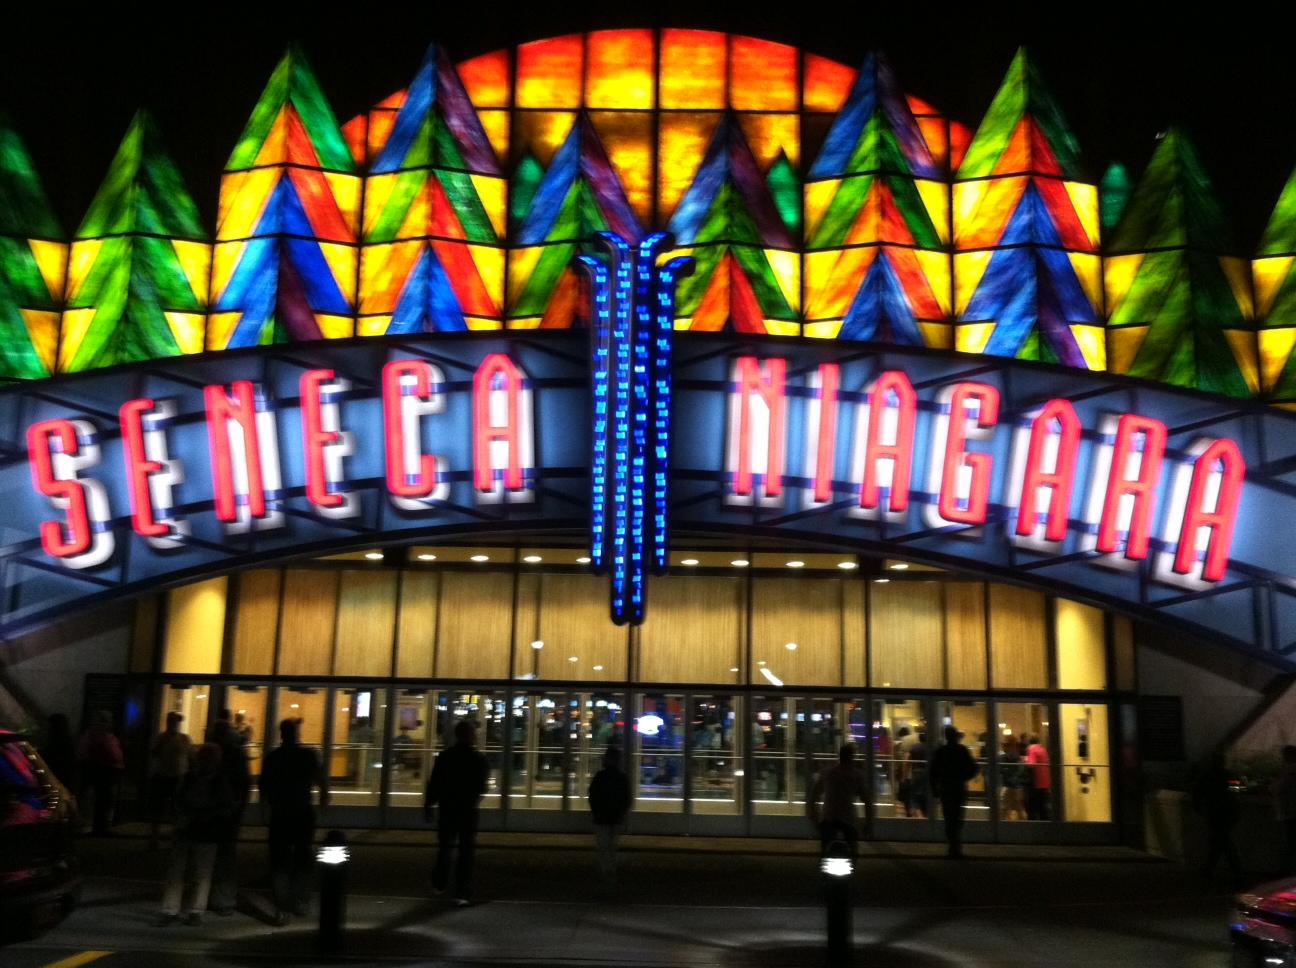 Seneca niagara casino blackjack tournament online nascar gambling